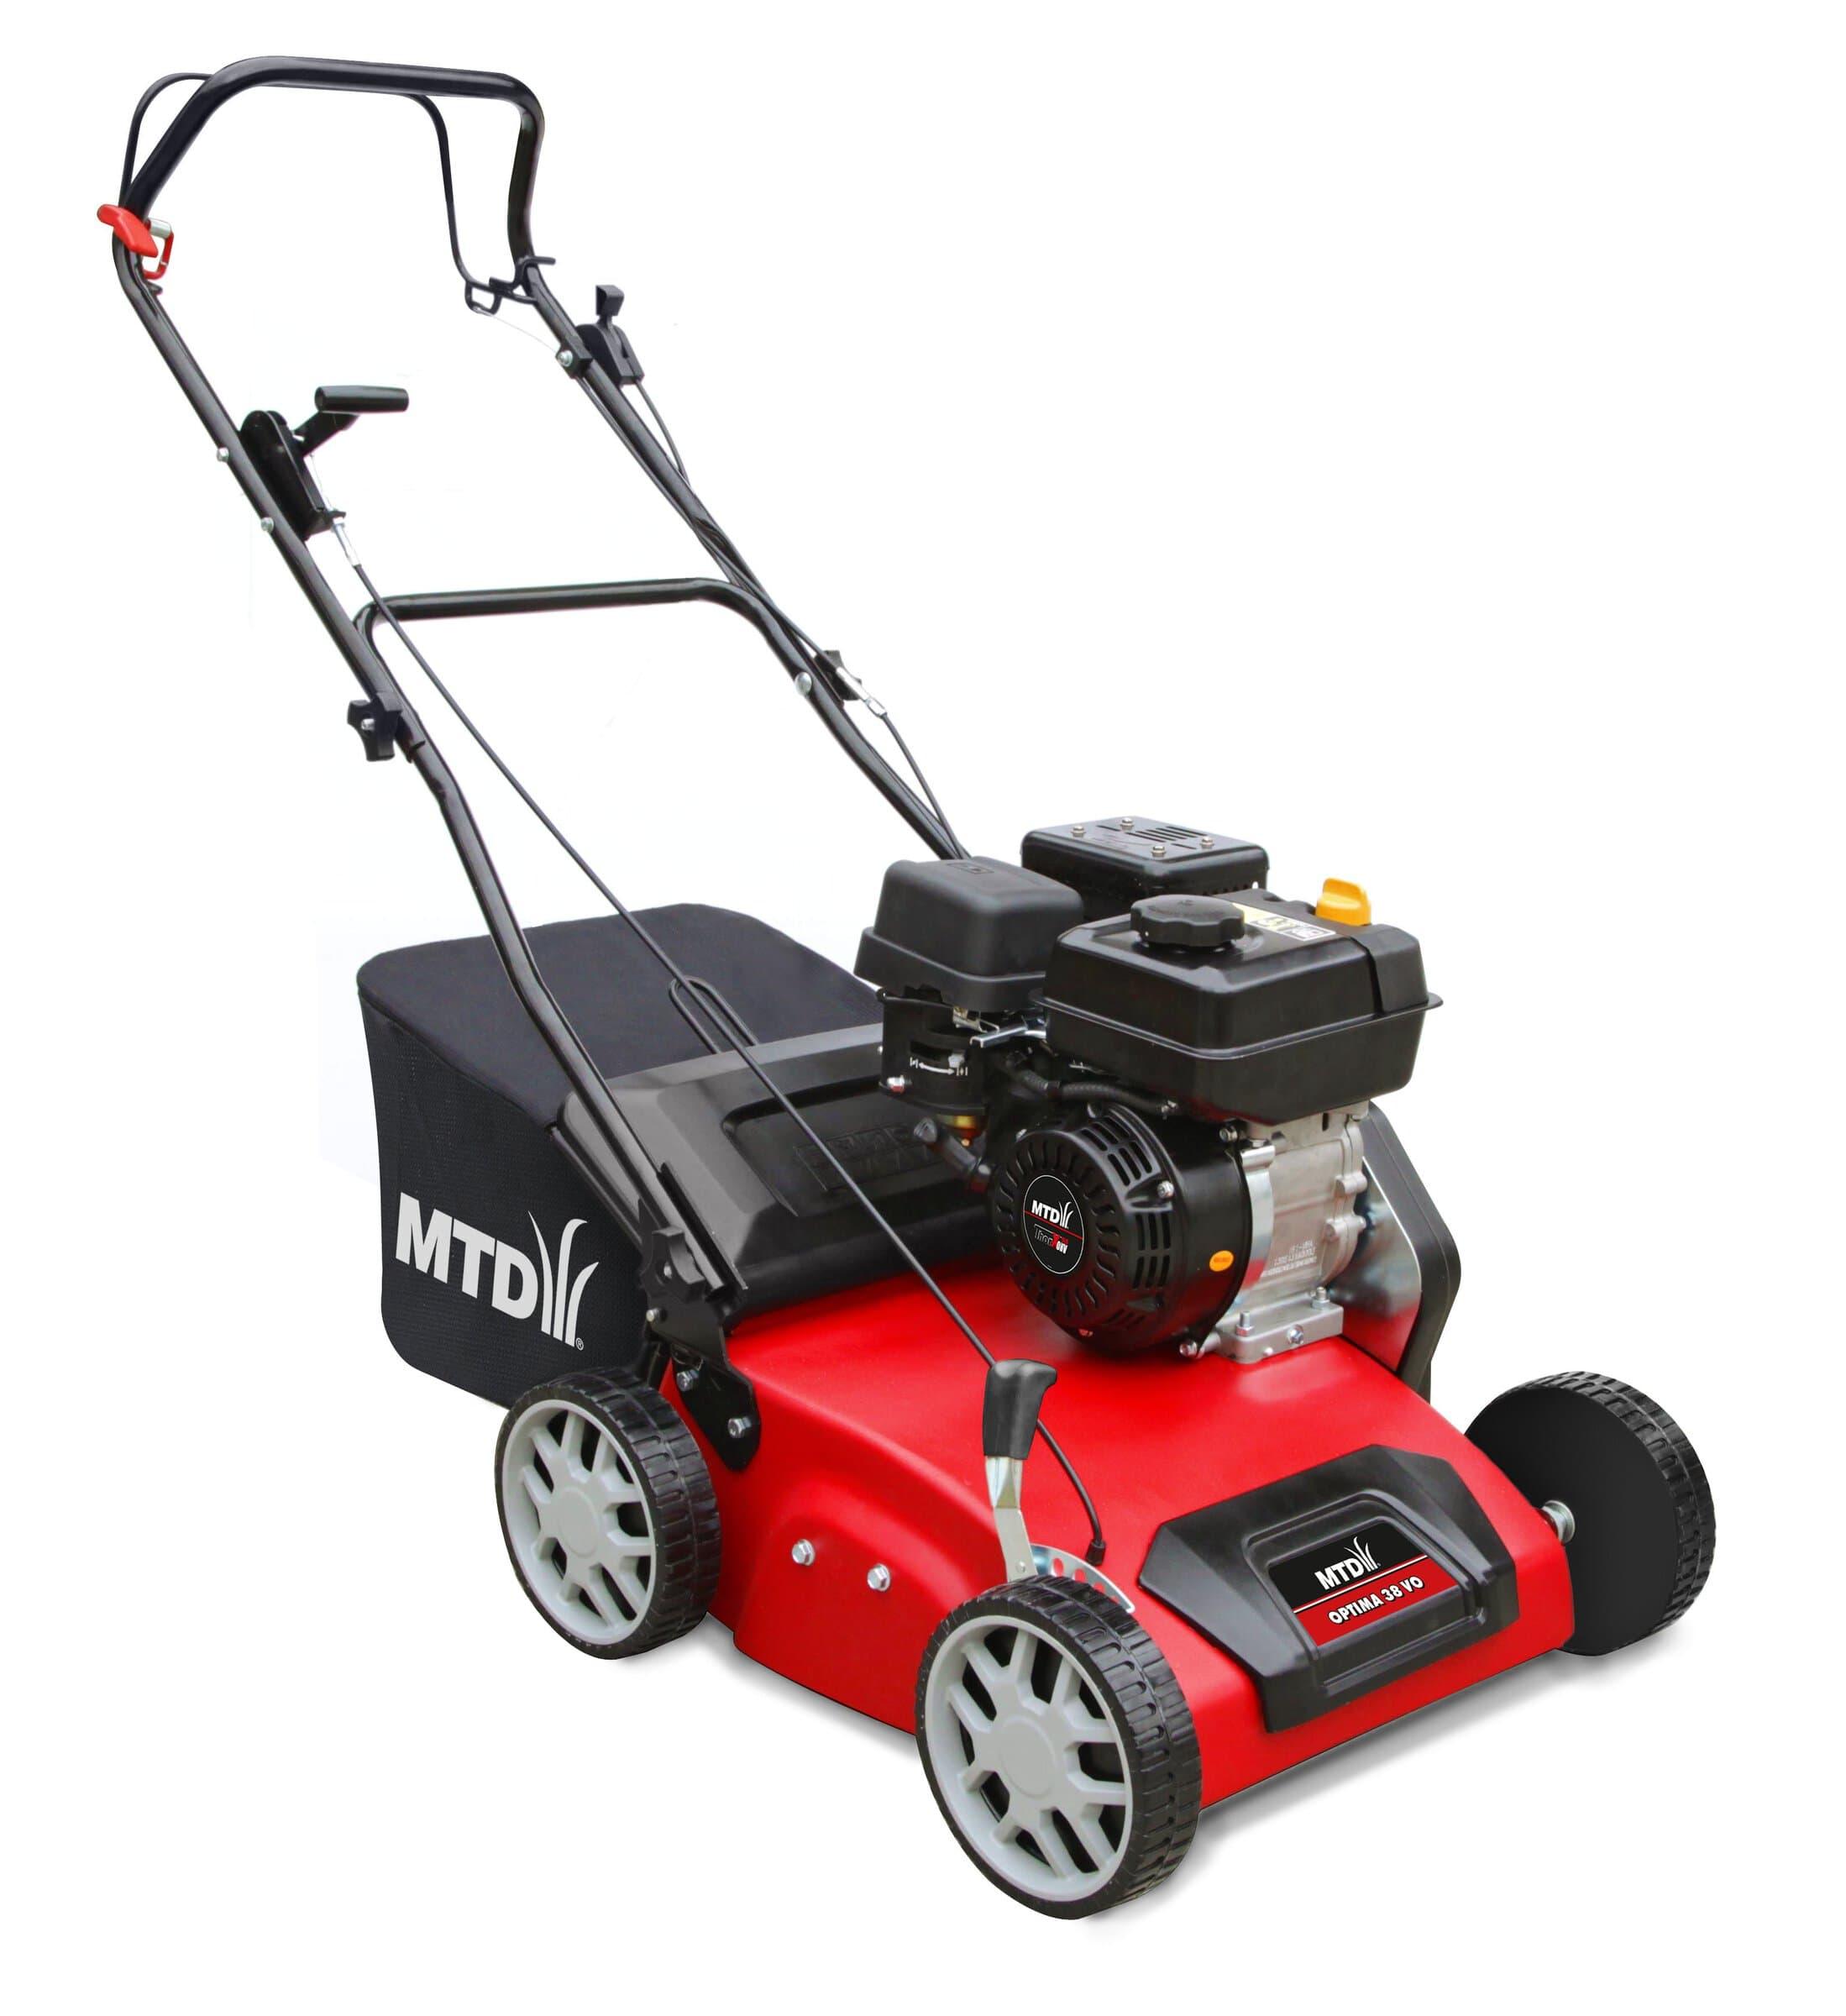 MTD OPTIMA 38 VO Benzin-Vertikutierer